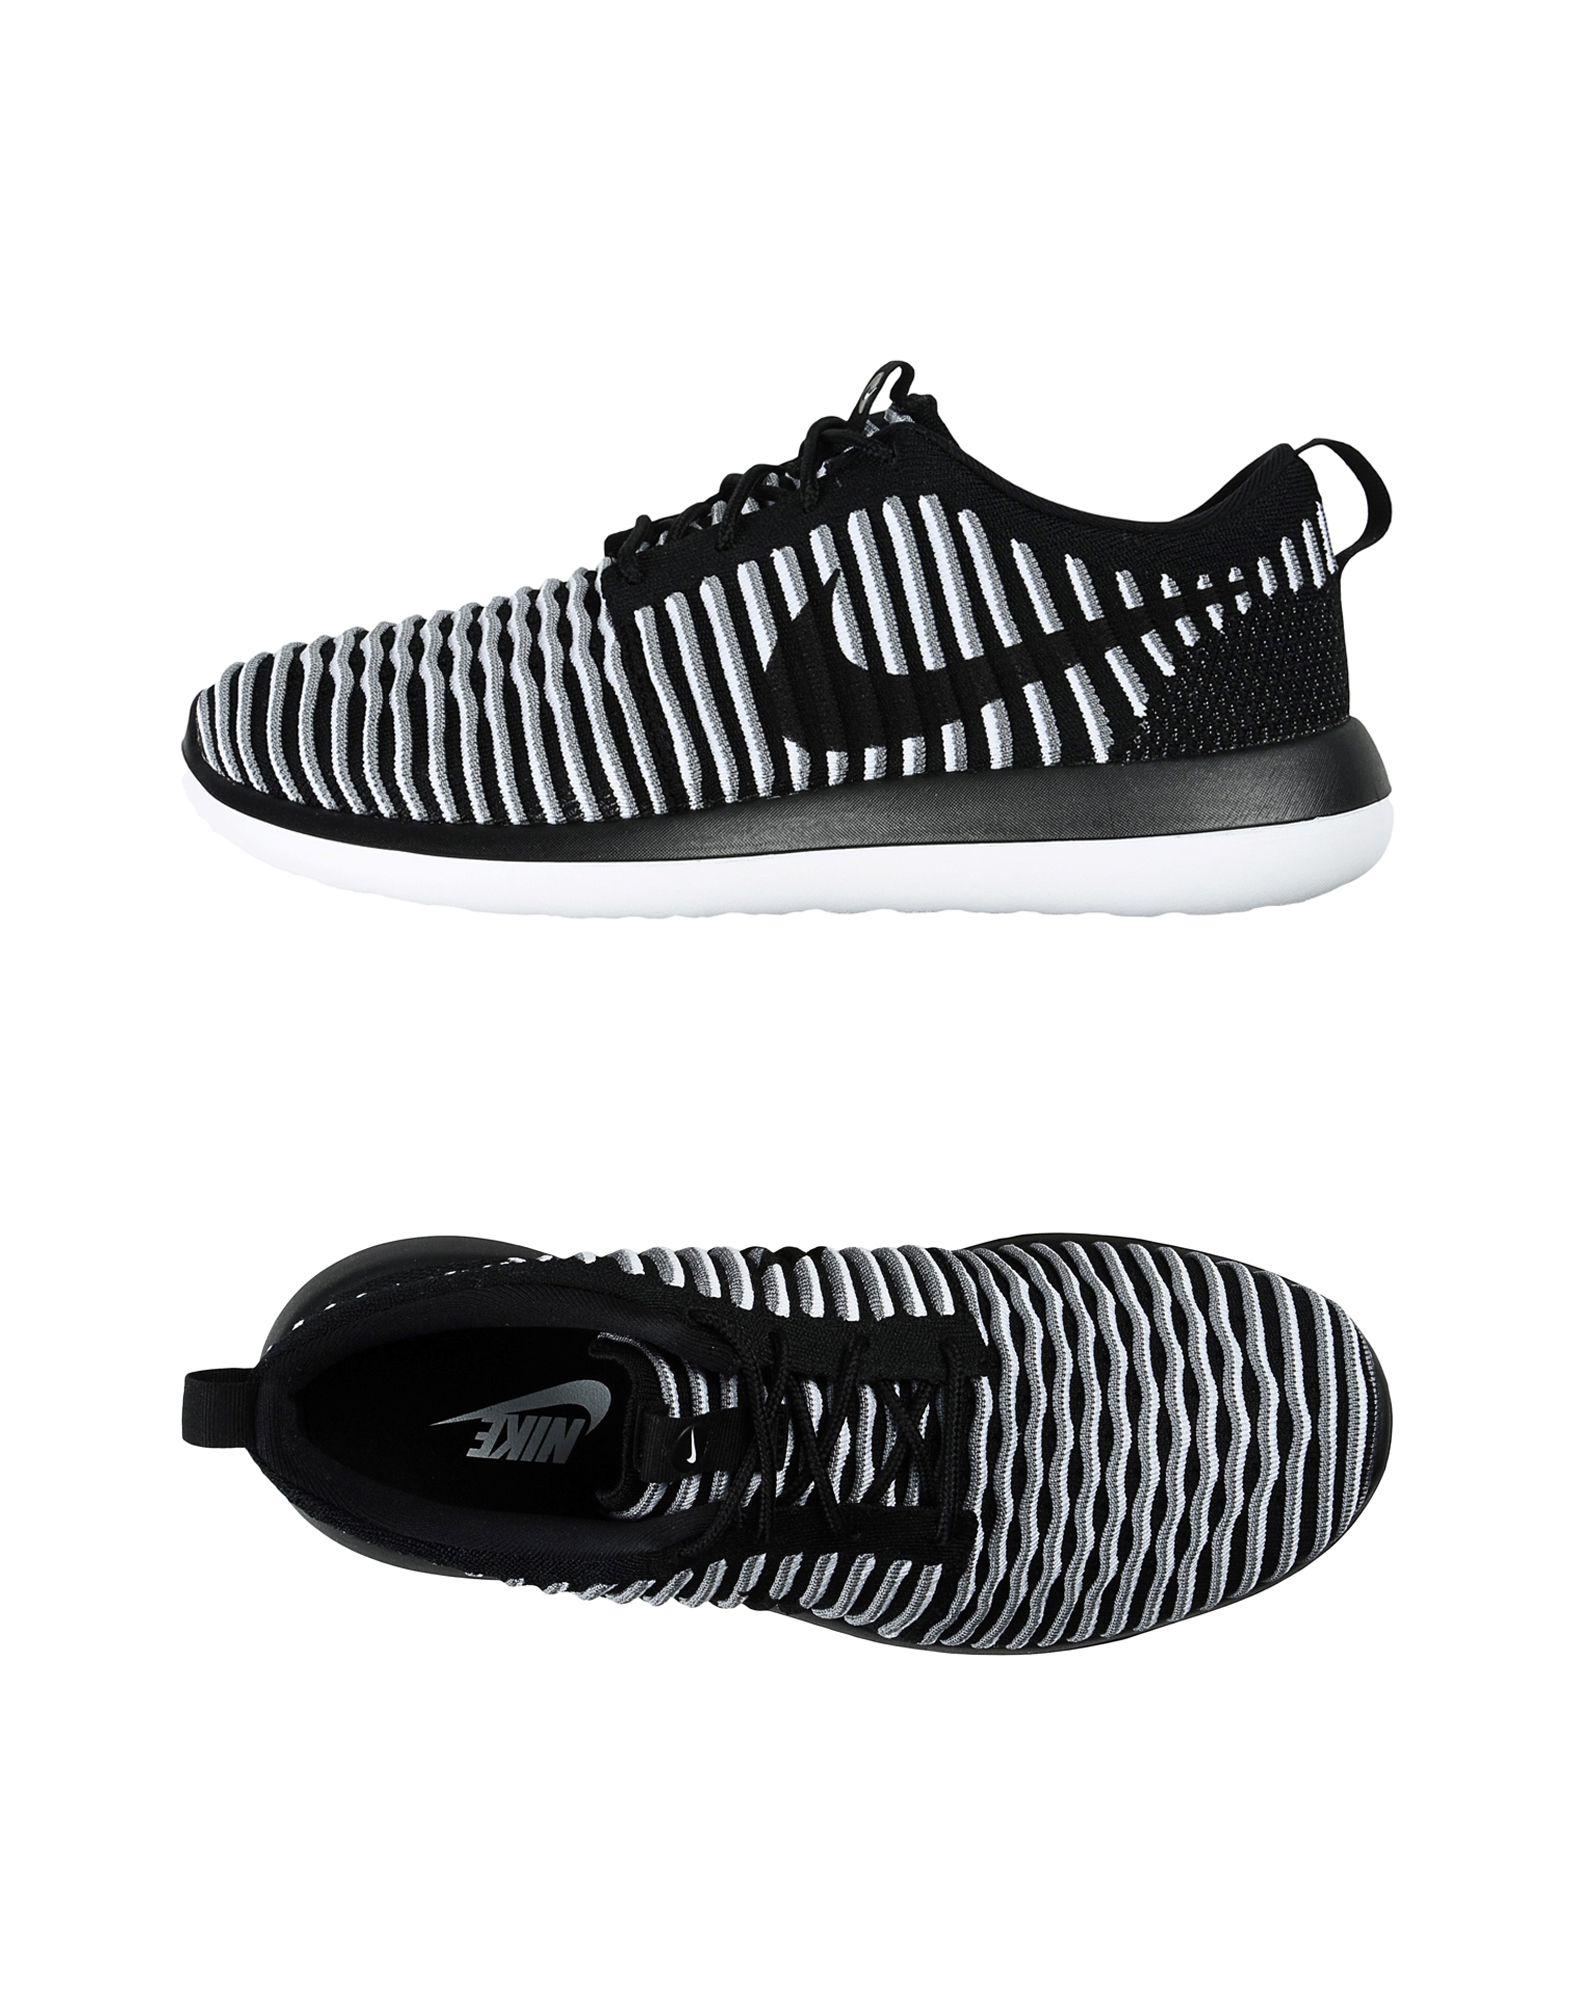 Scarpe da Ginnastica Nike   Donna Roshe Two Flyknit - Donna  - 11113625WF a457e1